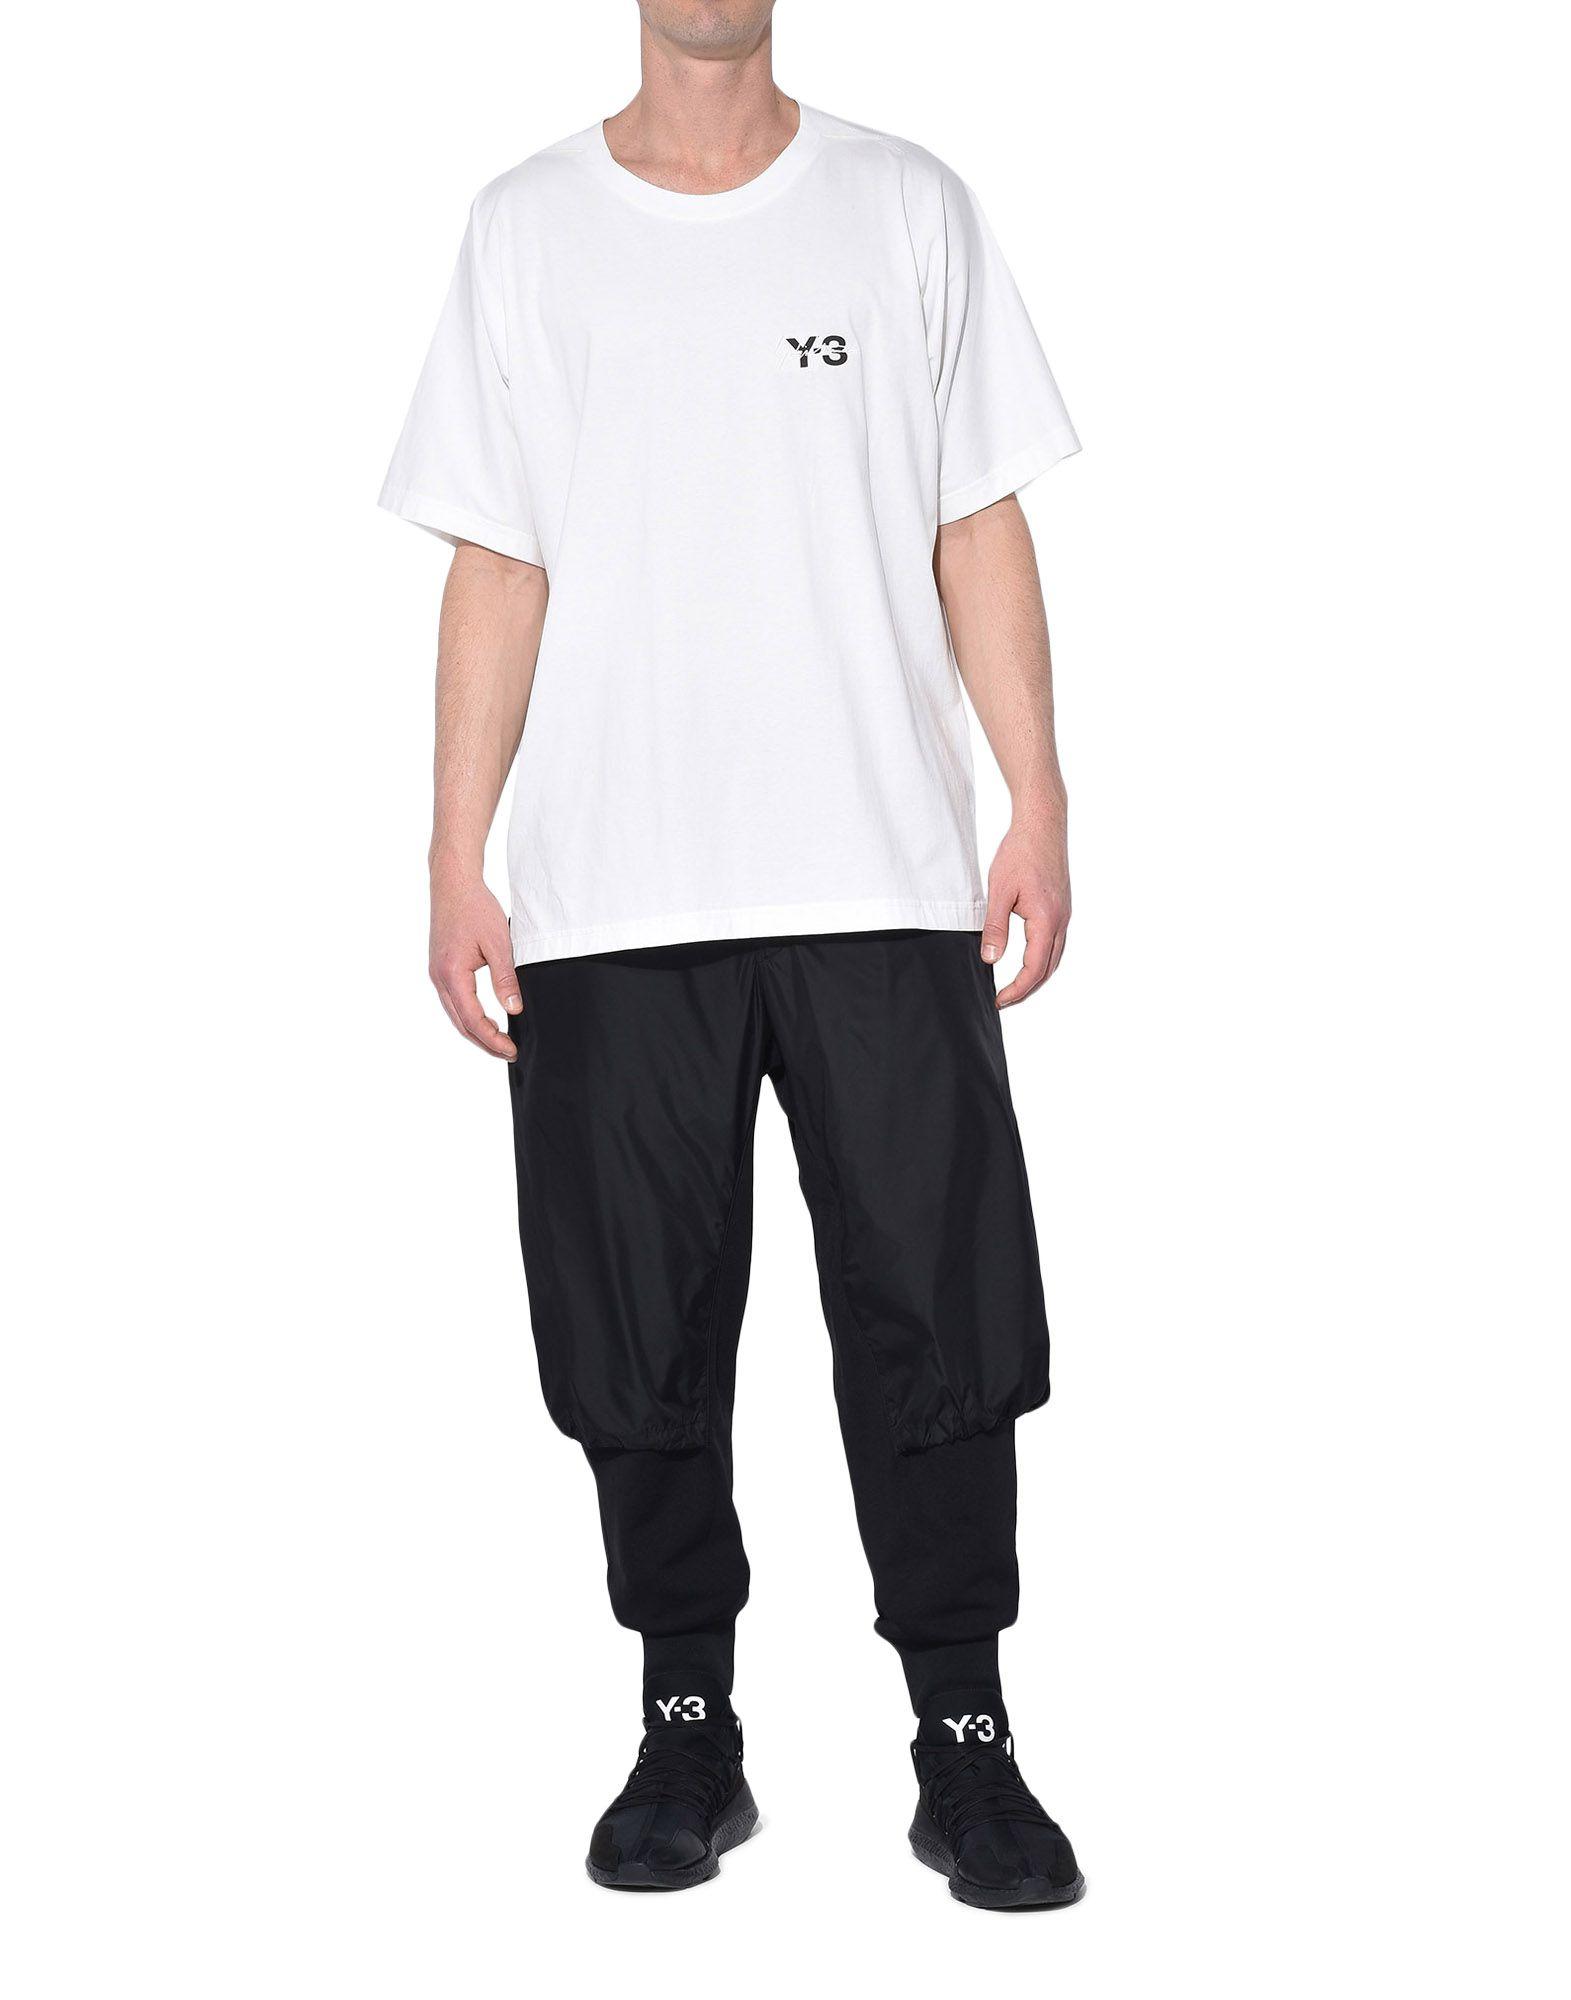 Y-3 Y-3 Signature Tee Short sleeve t-shirt Man a